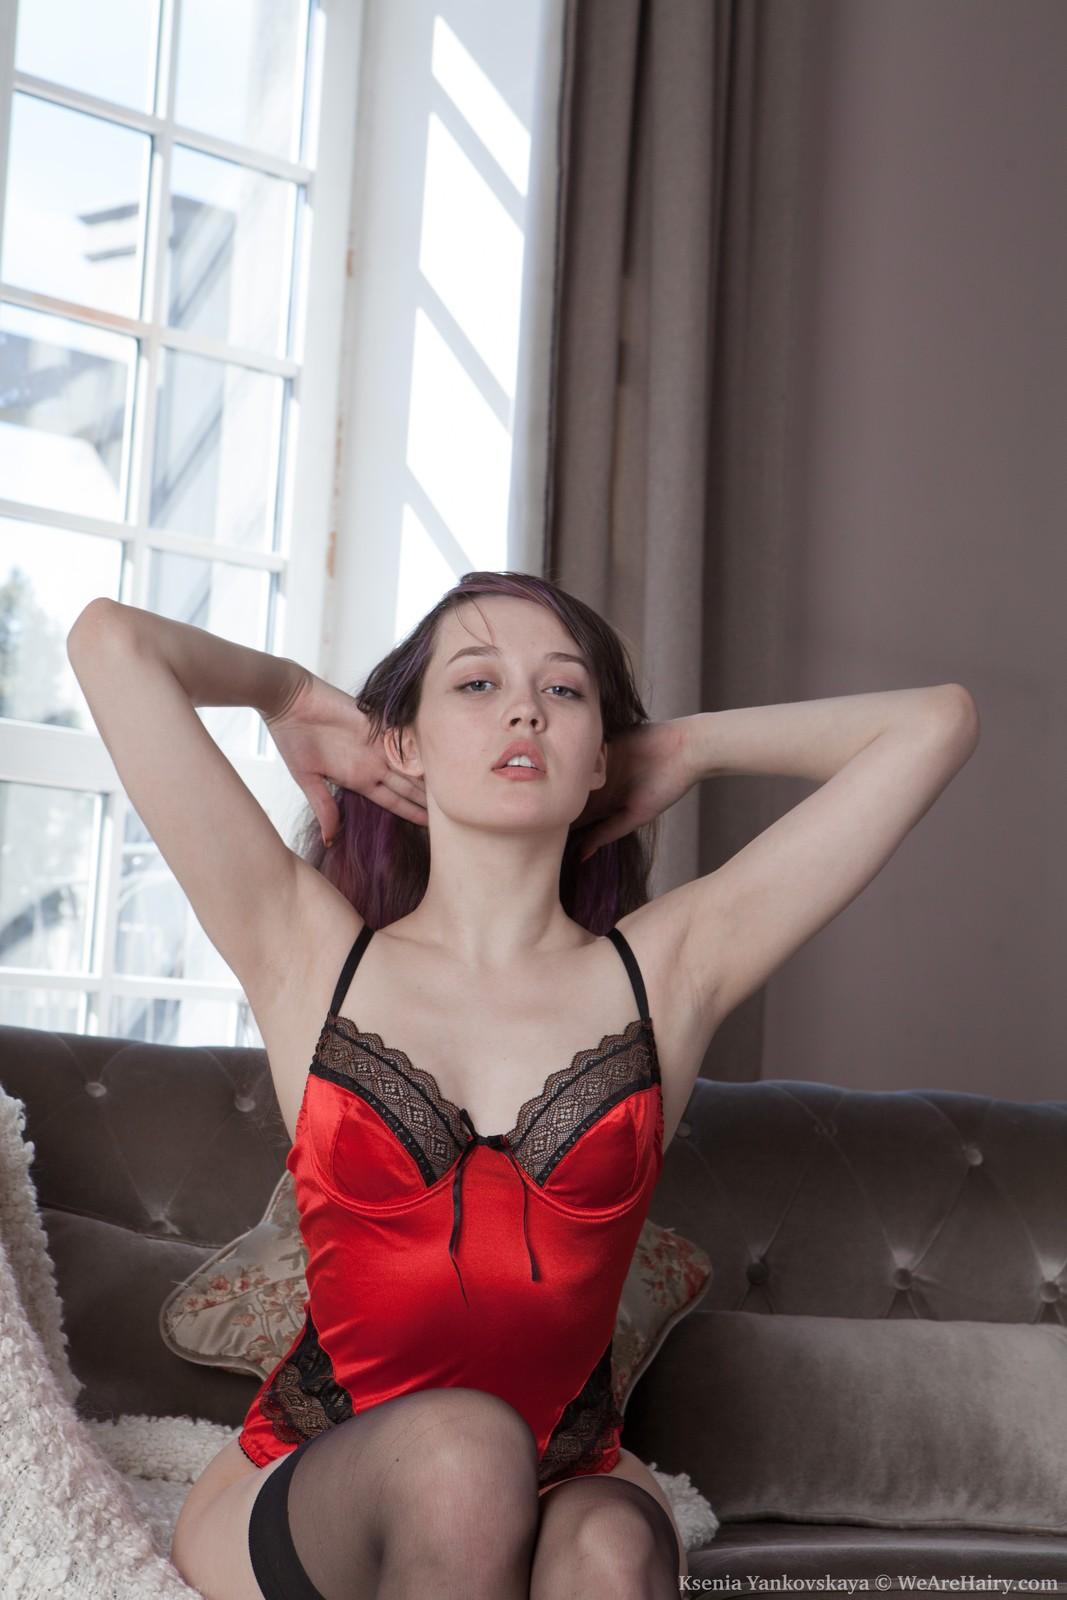 Ksenia Yankovskaya